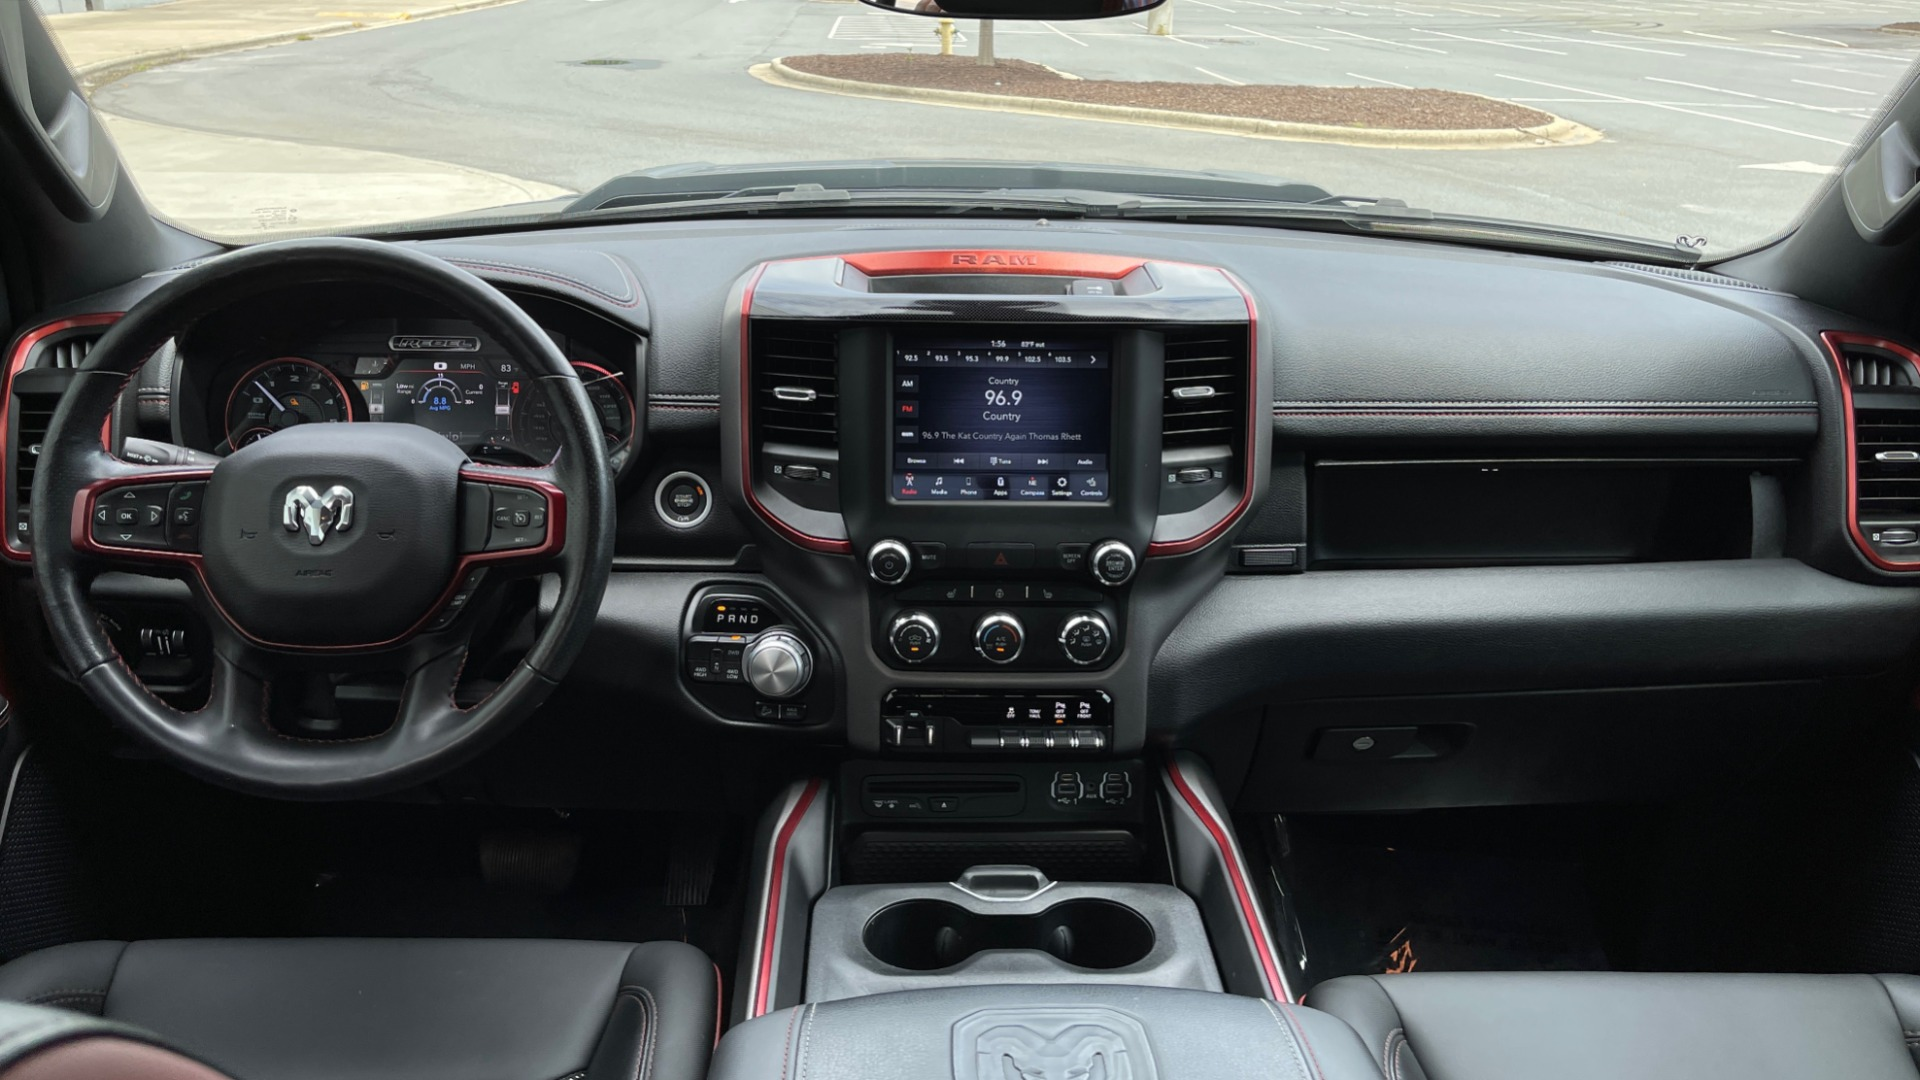 Used 2019 Ram 1500 REBEL QUADCAB 4X4 / 5.7L HEMI / 8-SPD AUTO / REMOTE START / PARK ASSIST for sale $44,495 at Formula Imports in Charlotte NC 28227 57